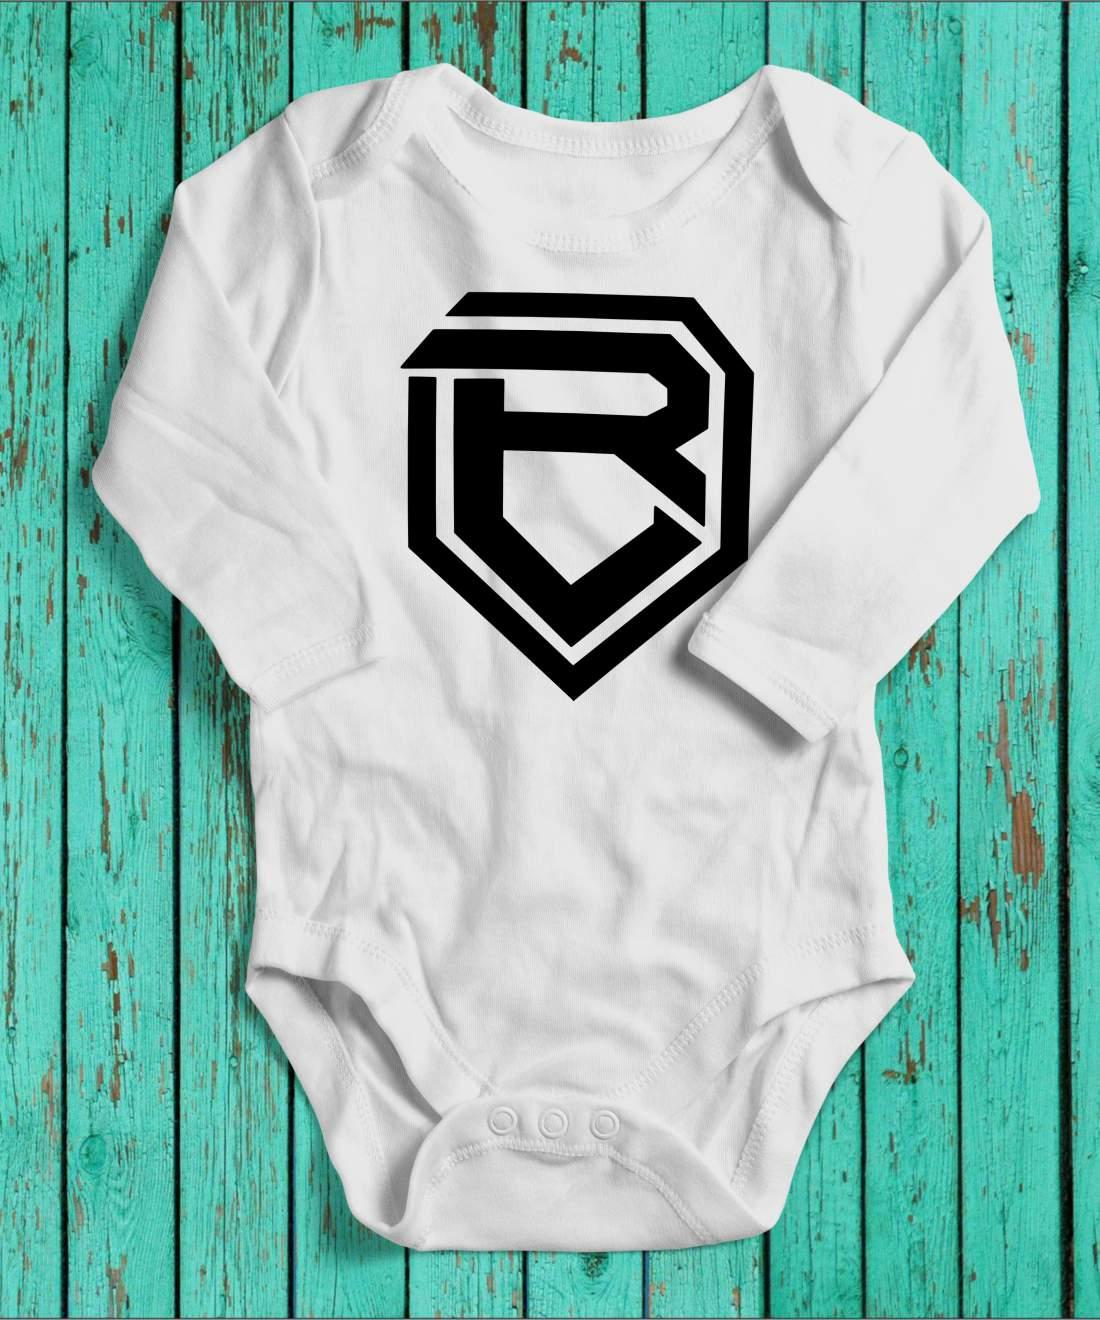 Botondroll baby body fehér